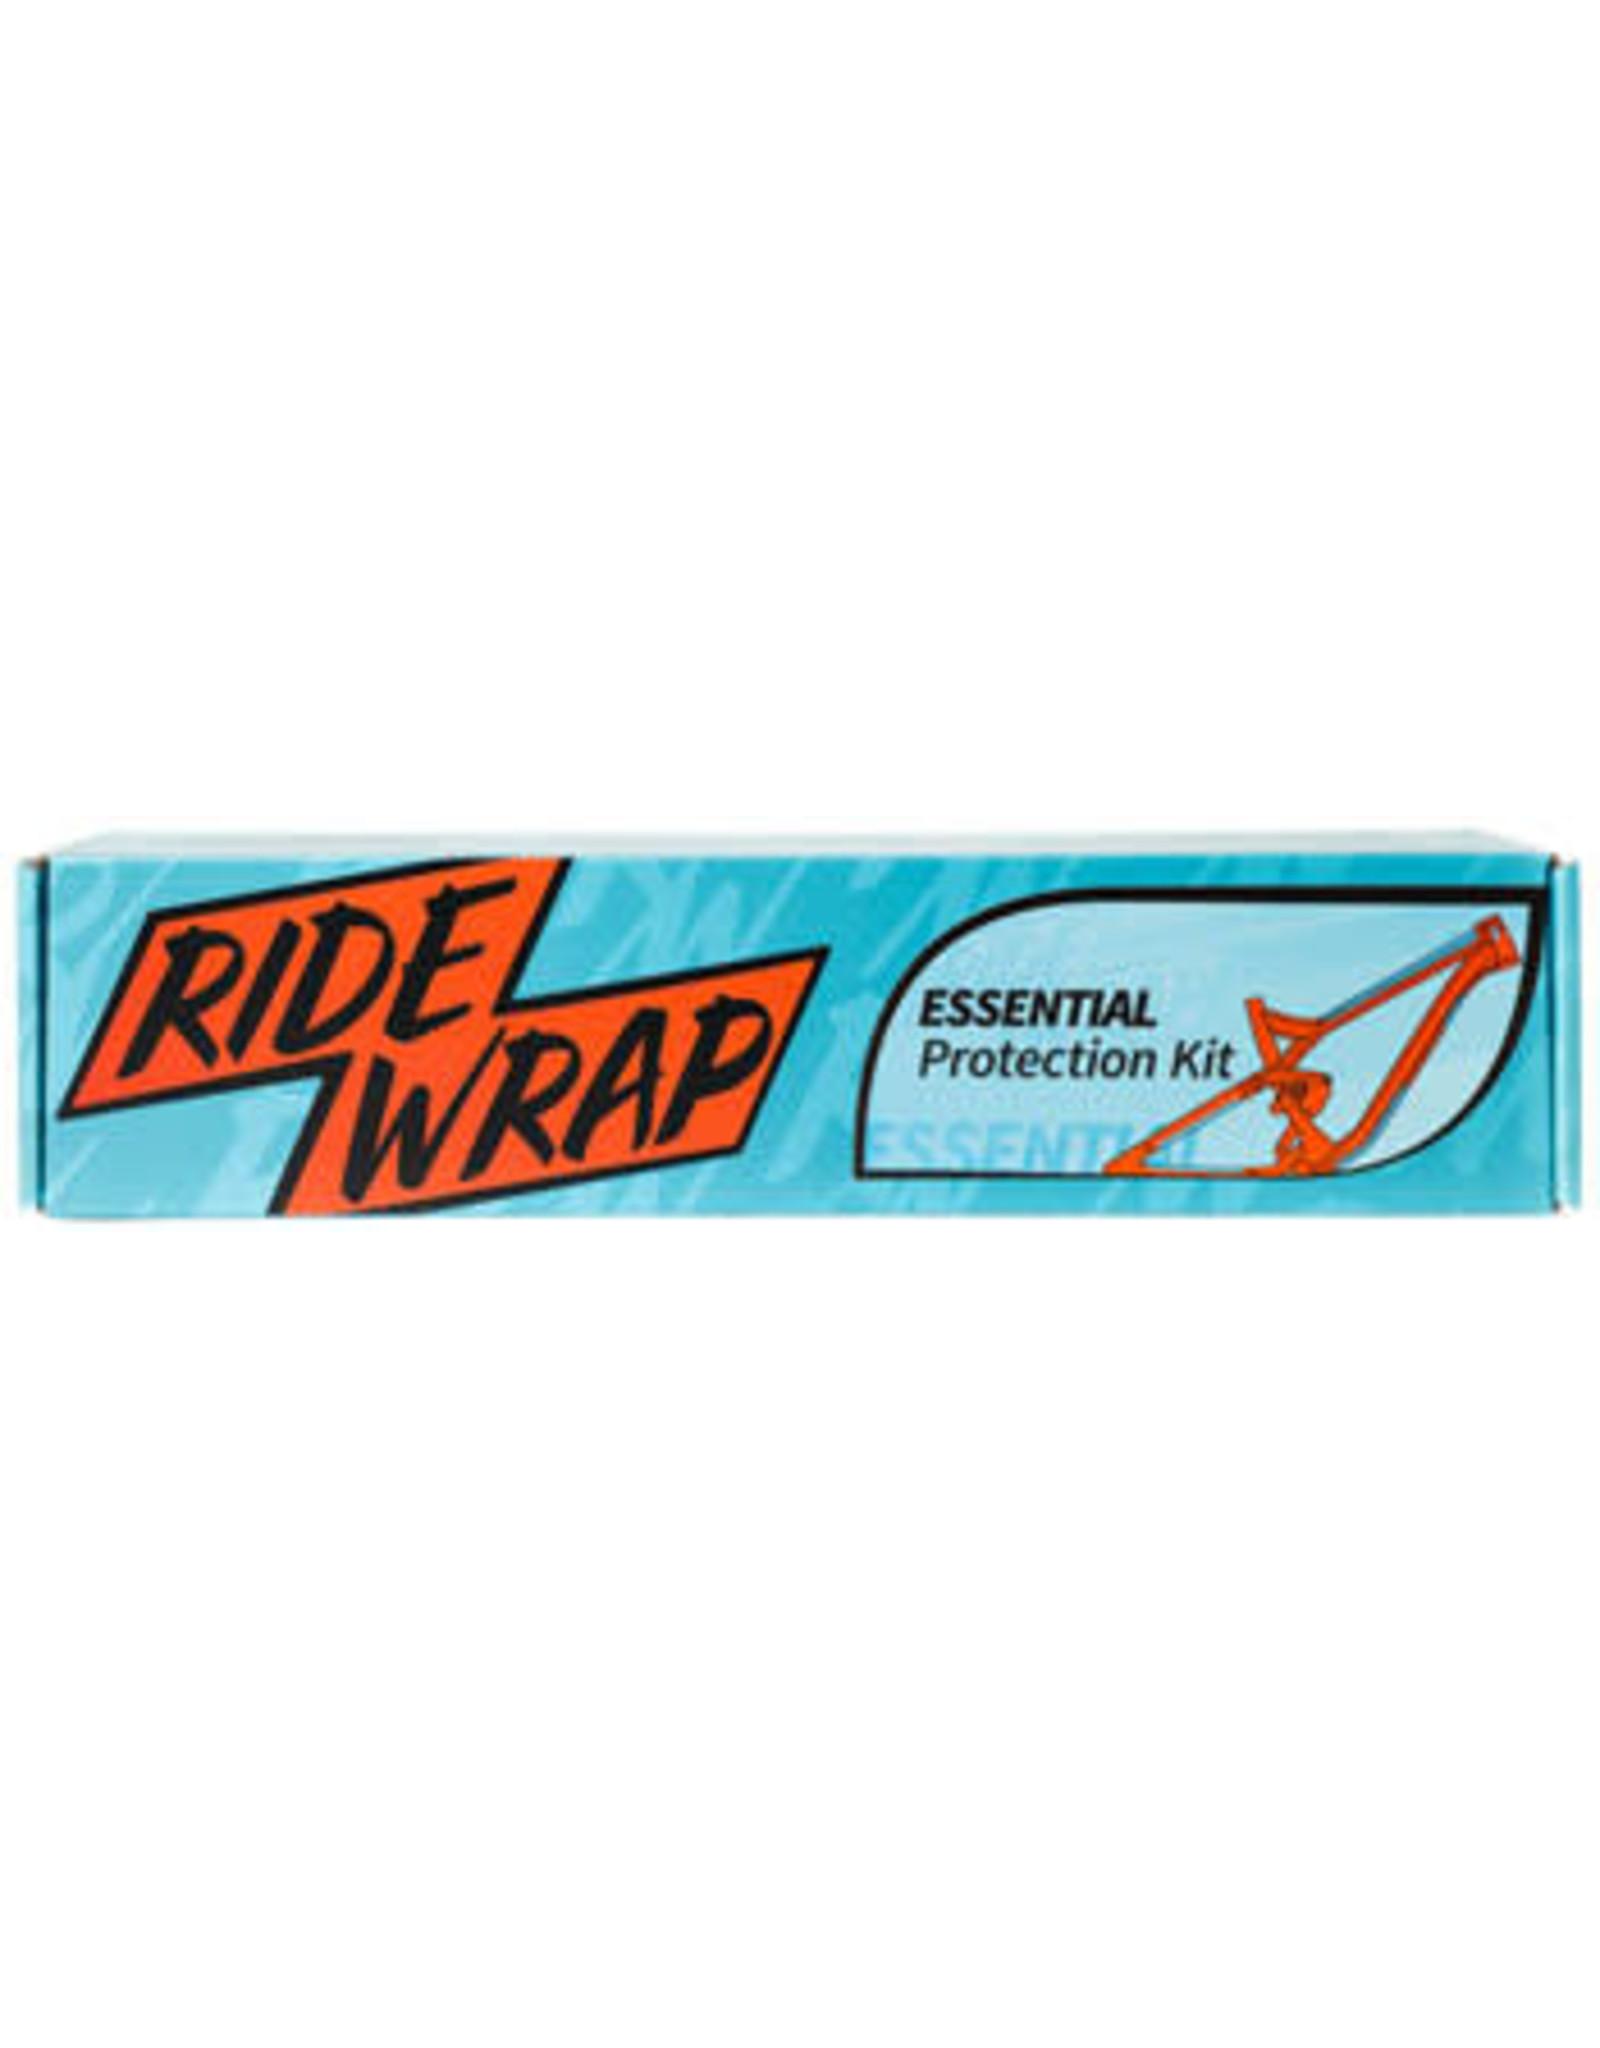 RideWrap RideWrap Covered Steel MTB Frame Protection Kit - Matte